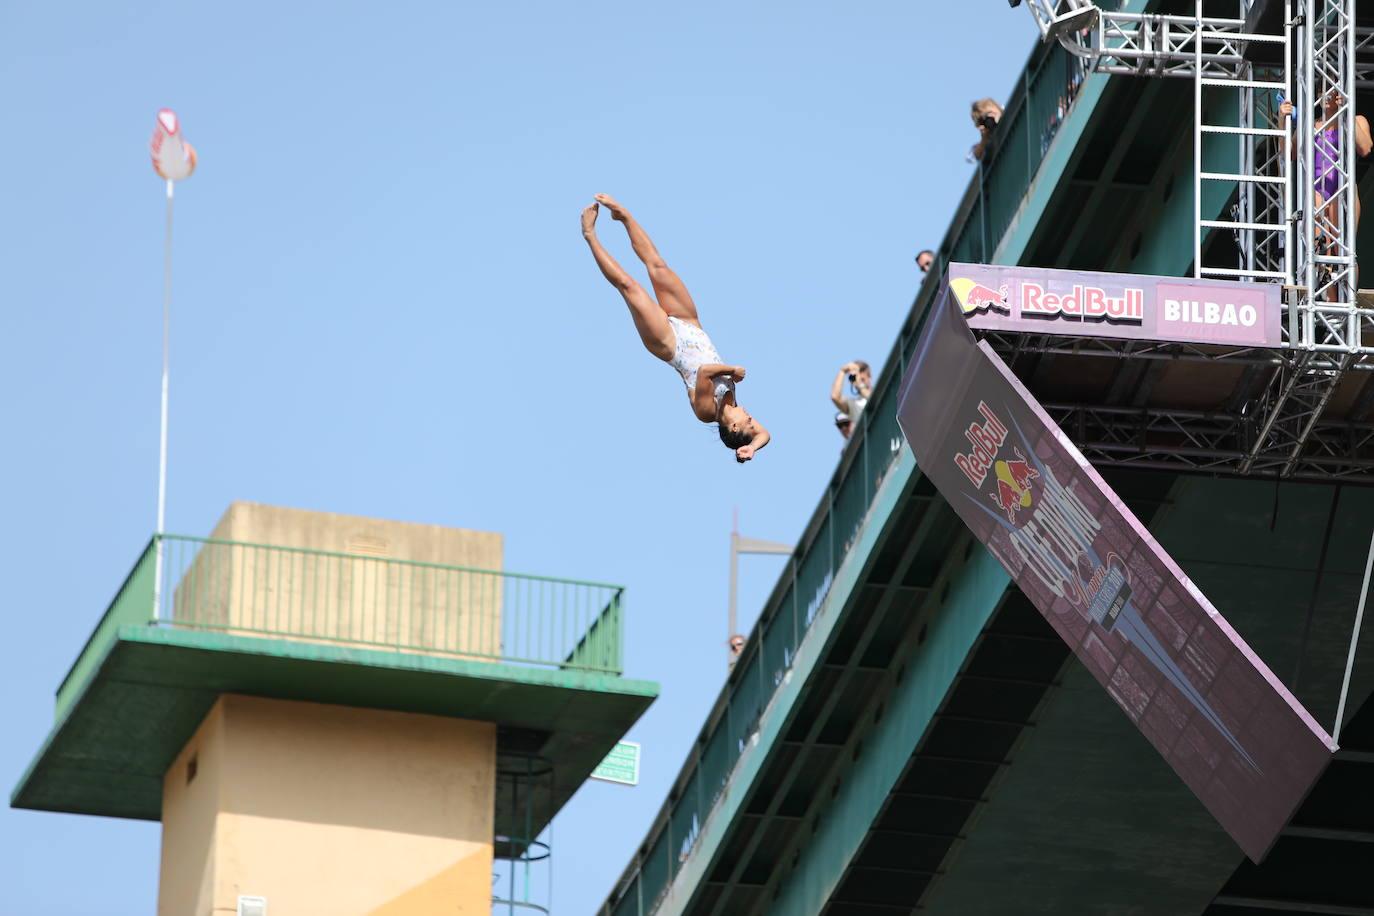 Las mejores imágenes de la final de saltos 'Red Bull Cliff Diving'